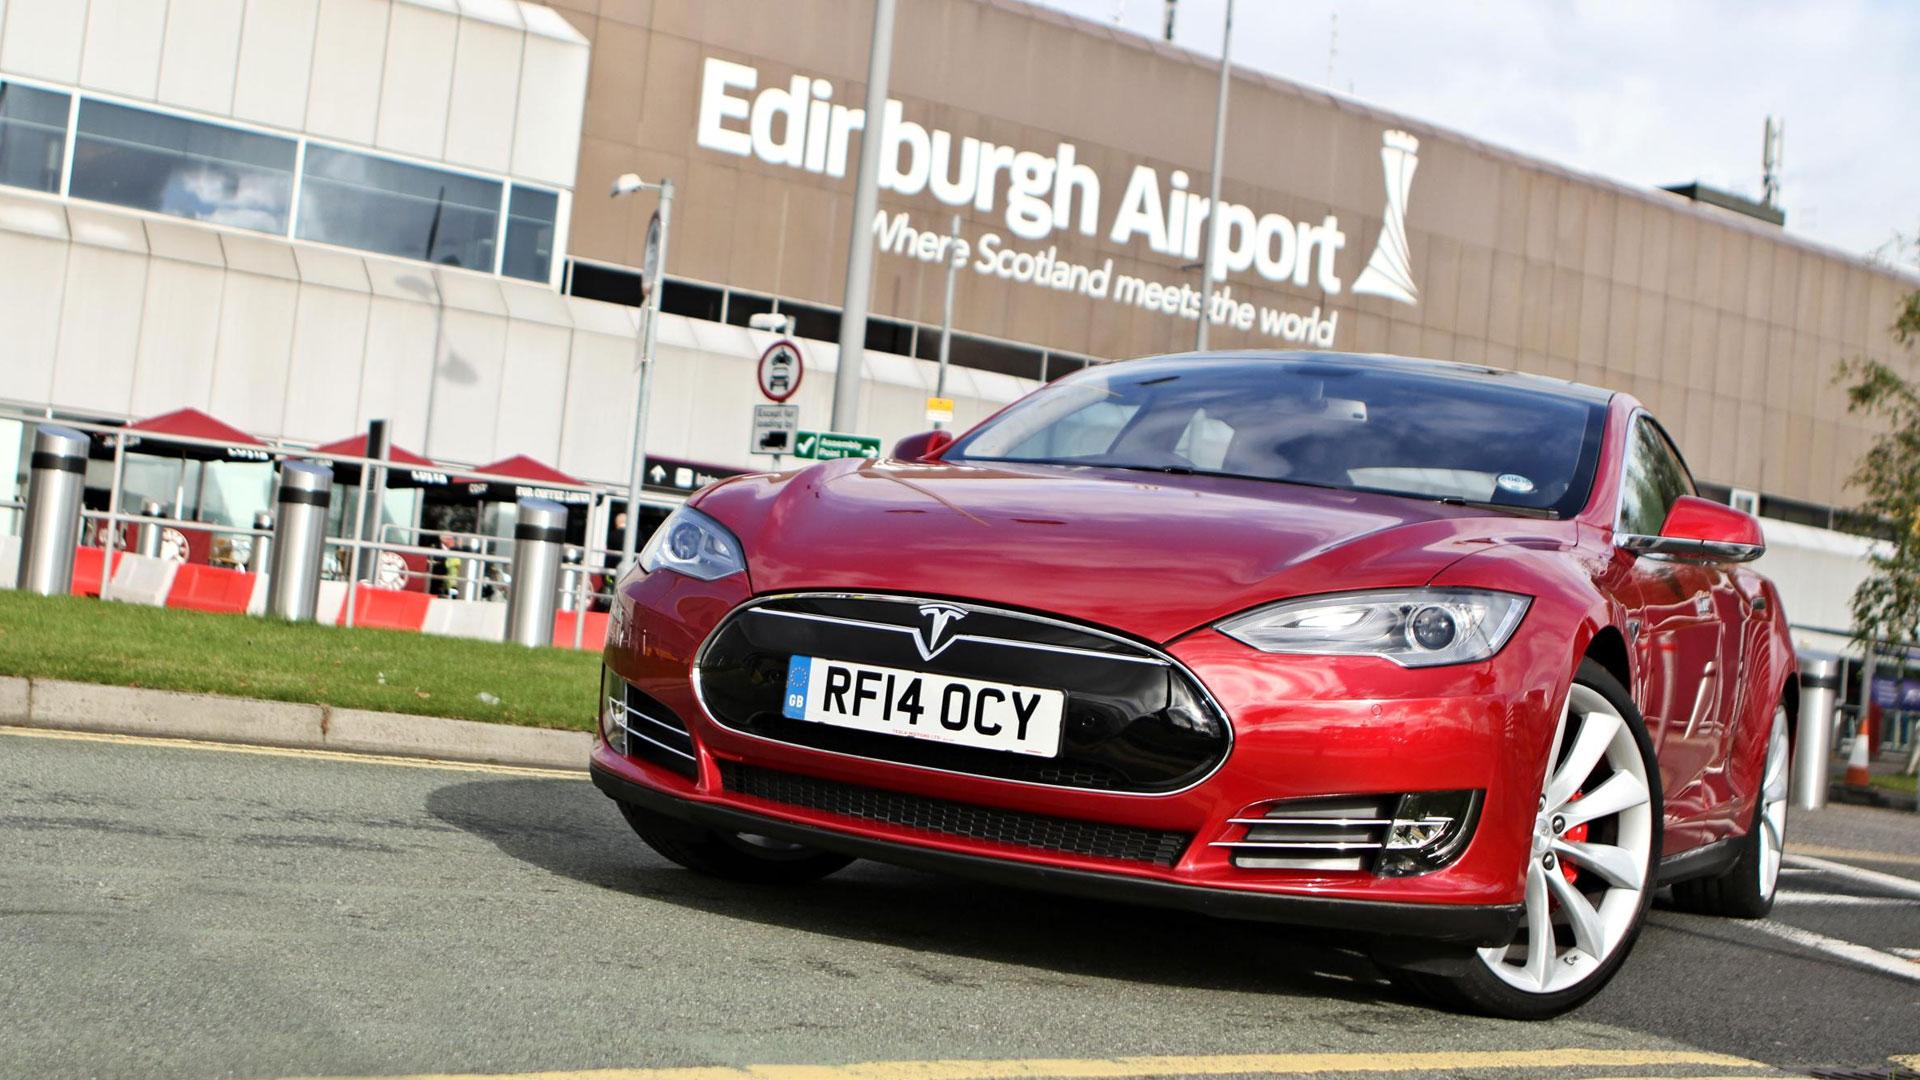 Tesla at Edinburgh Airport